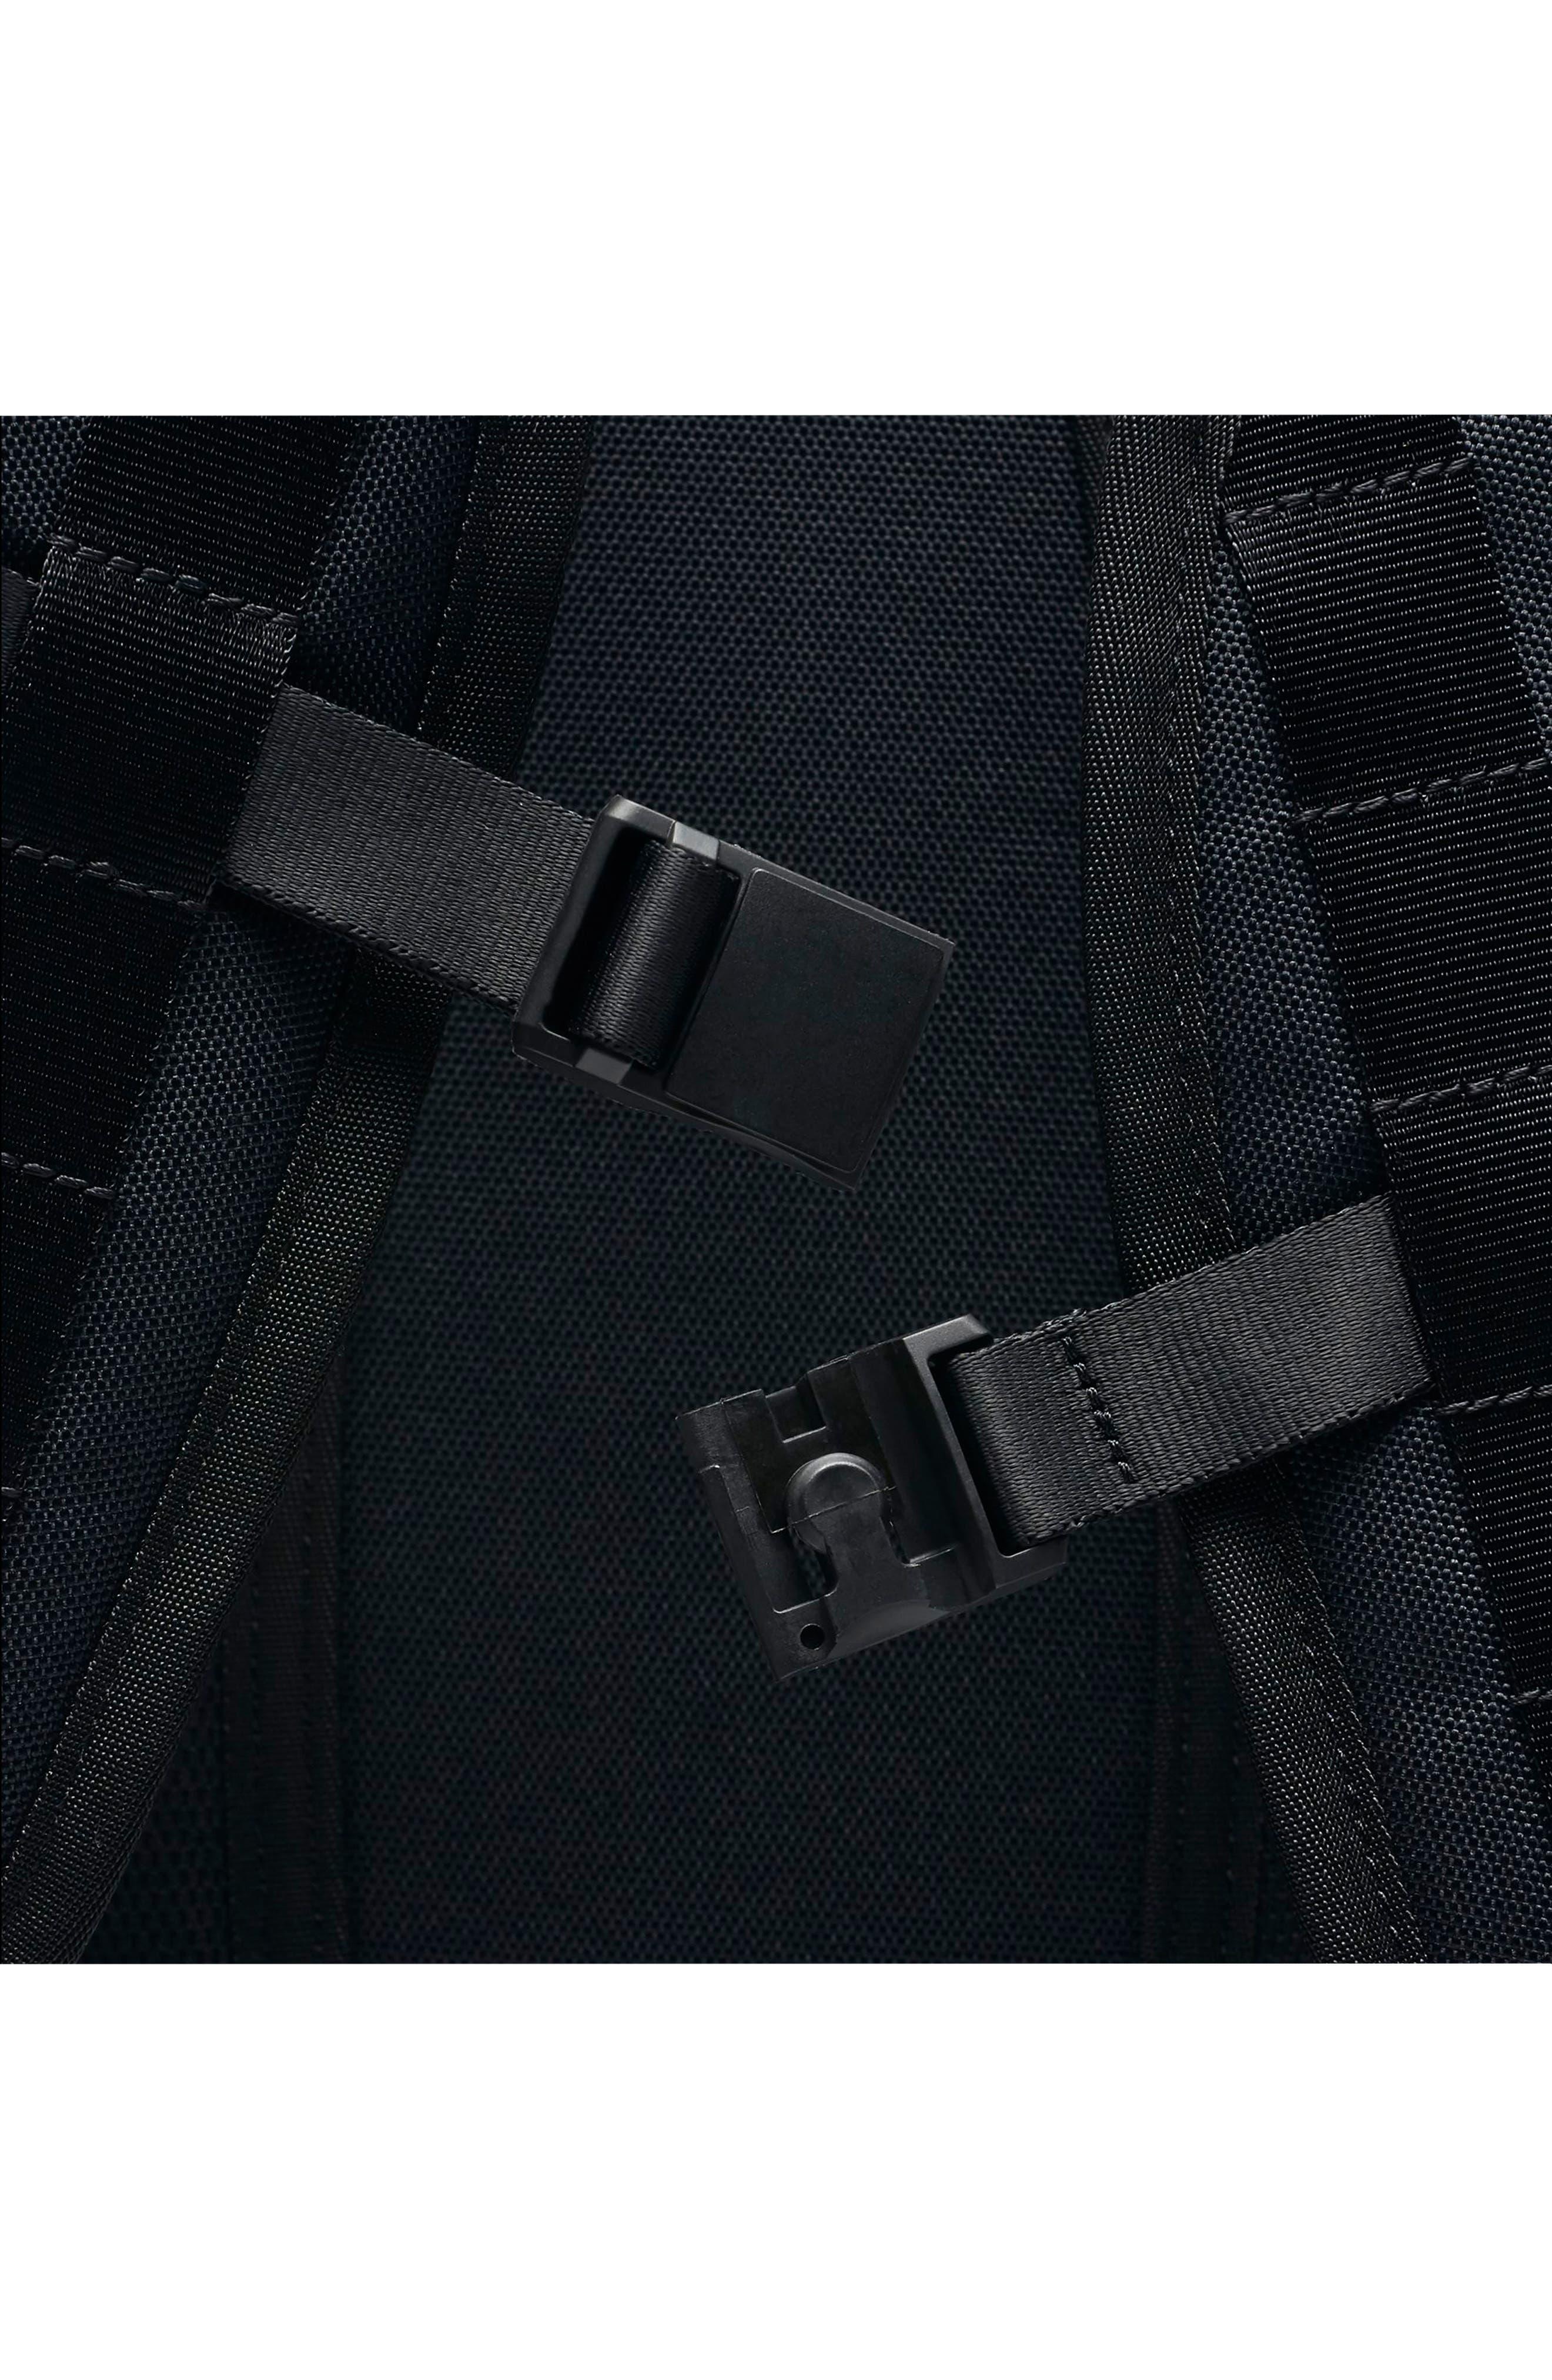 NikeLab Laptop Backpack,                             Alternate thumbnail 7, color,                             010